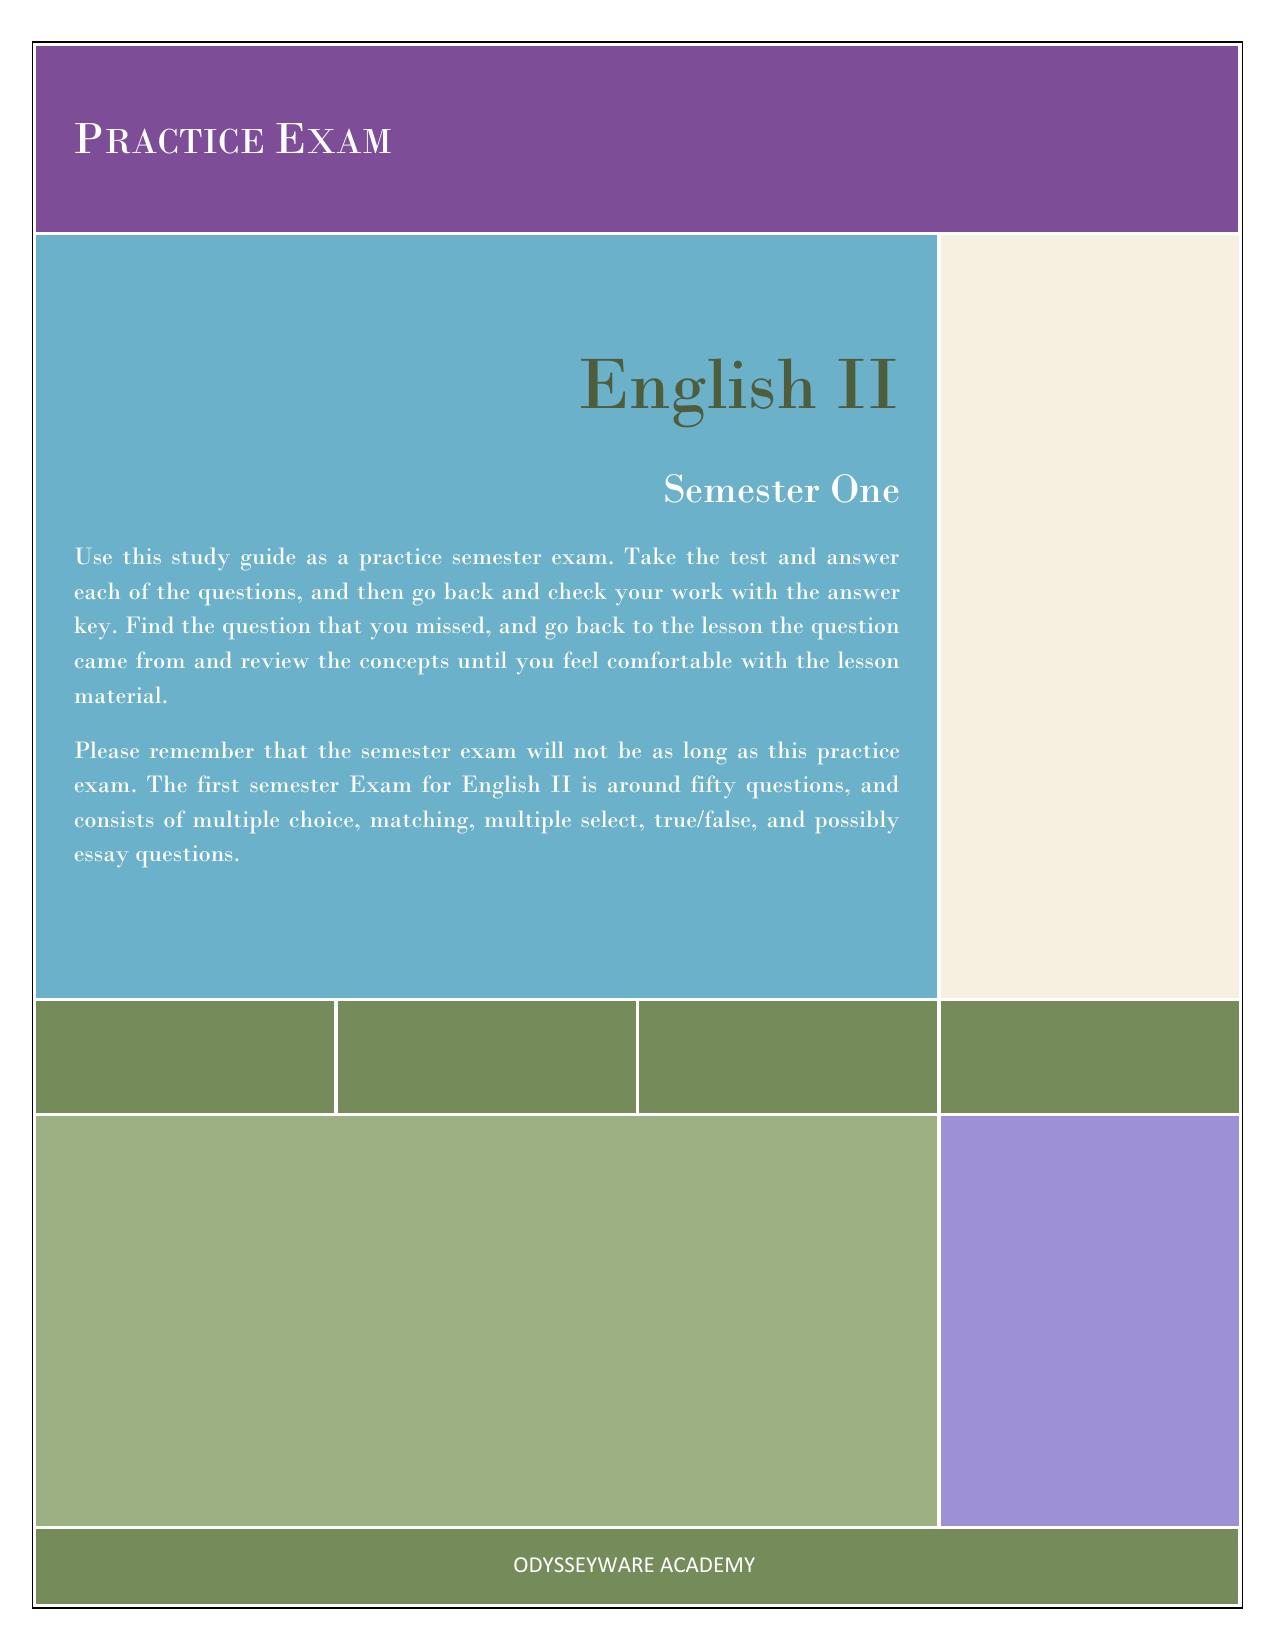 answers for exam english iii odysseyware